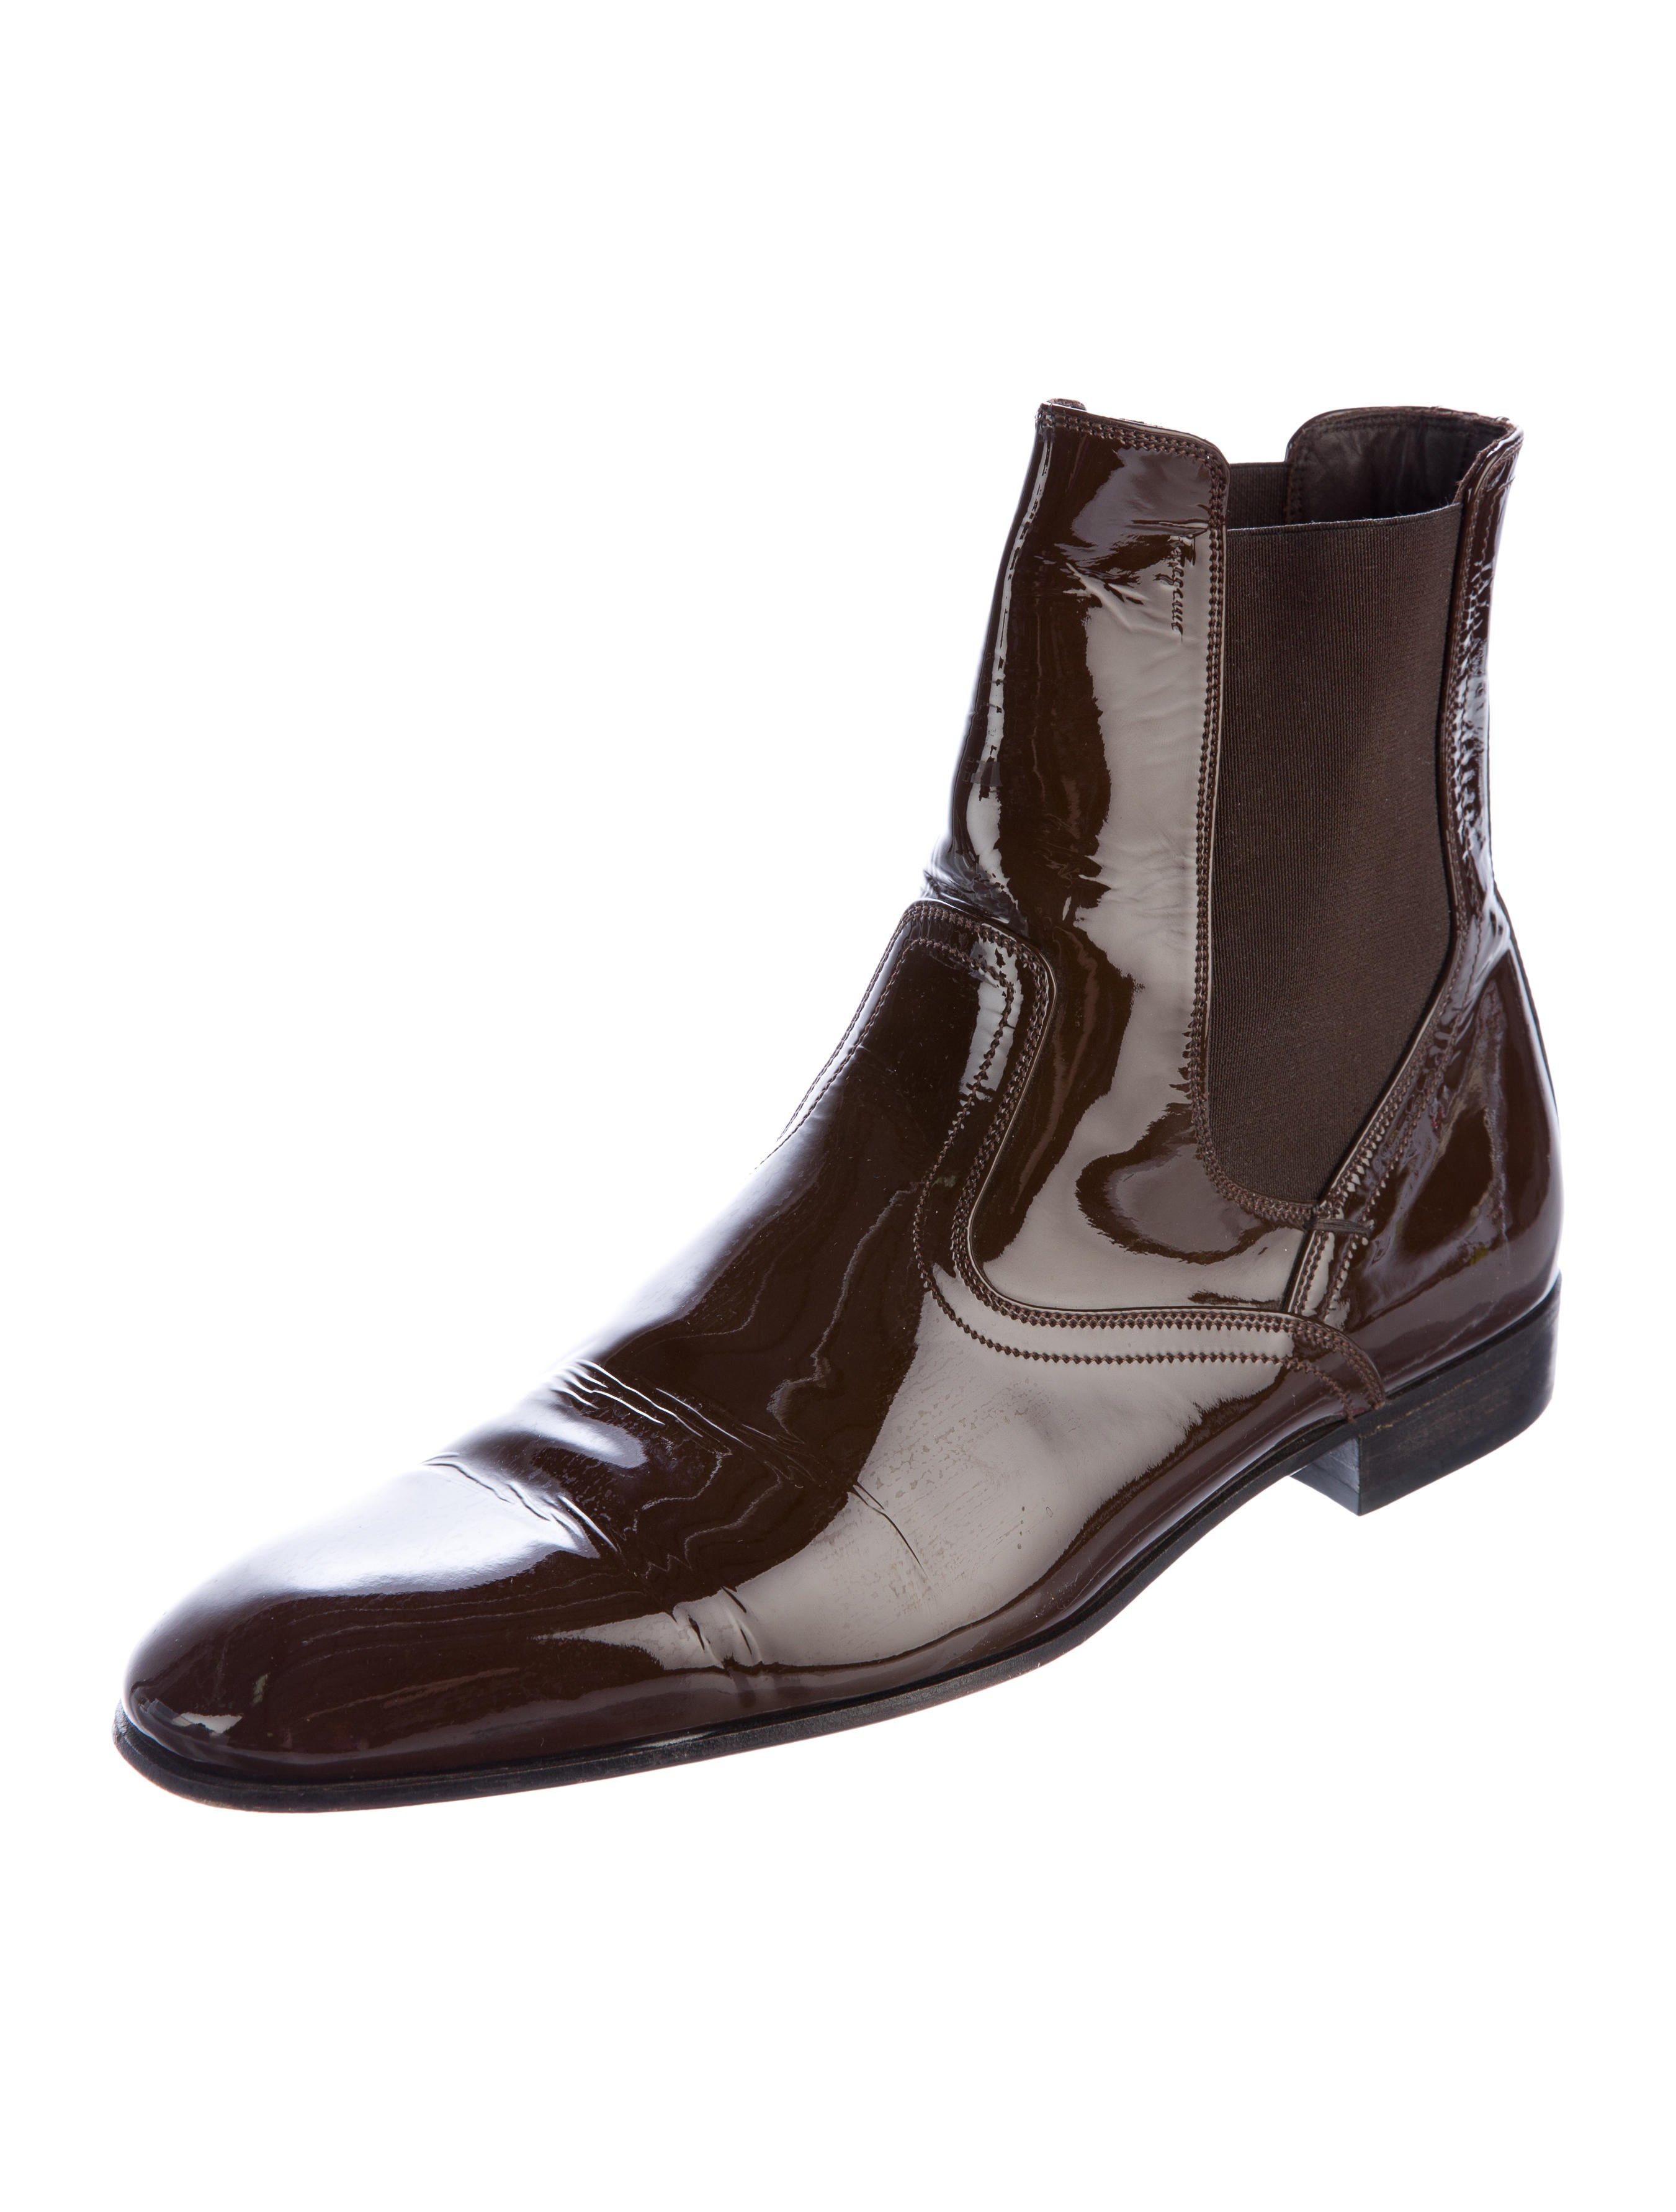 salvatore ferragamo patent leather chelsea boots shoes